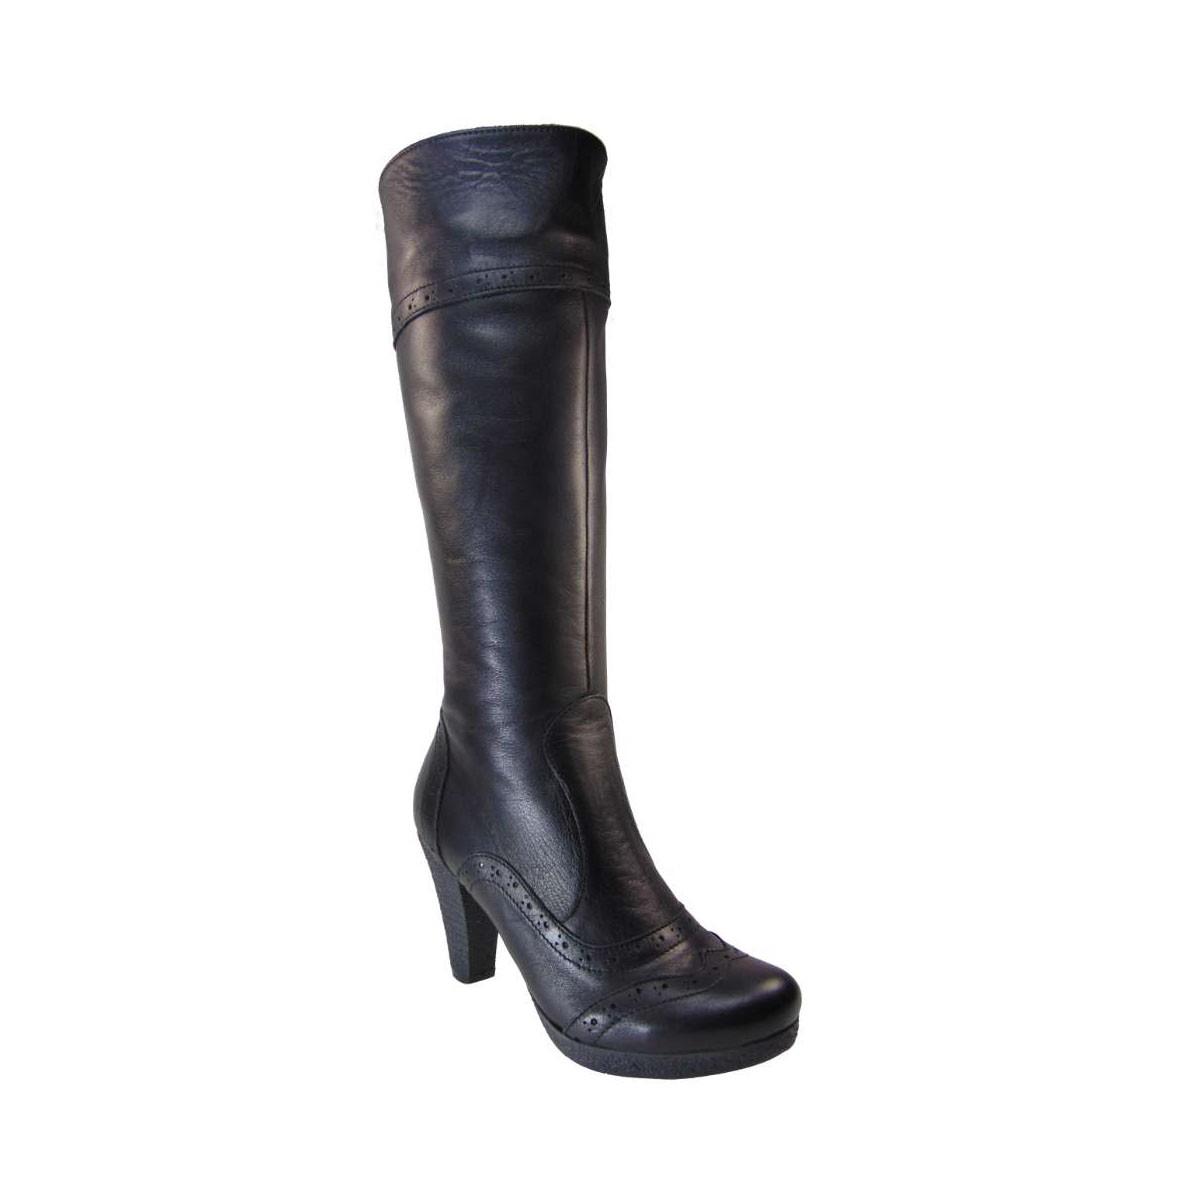 Tsimpolis Shoes 0929 Oxford Μπότα Δερμάτινη Μαύρη